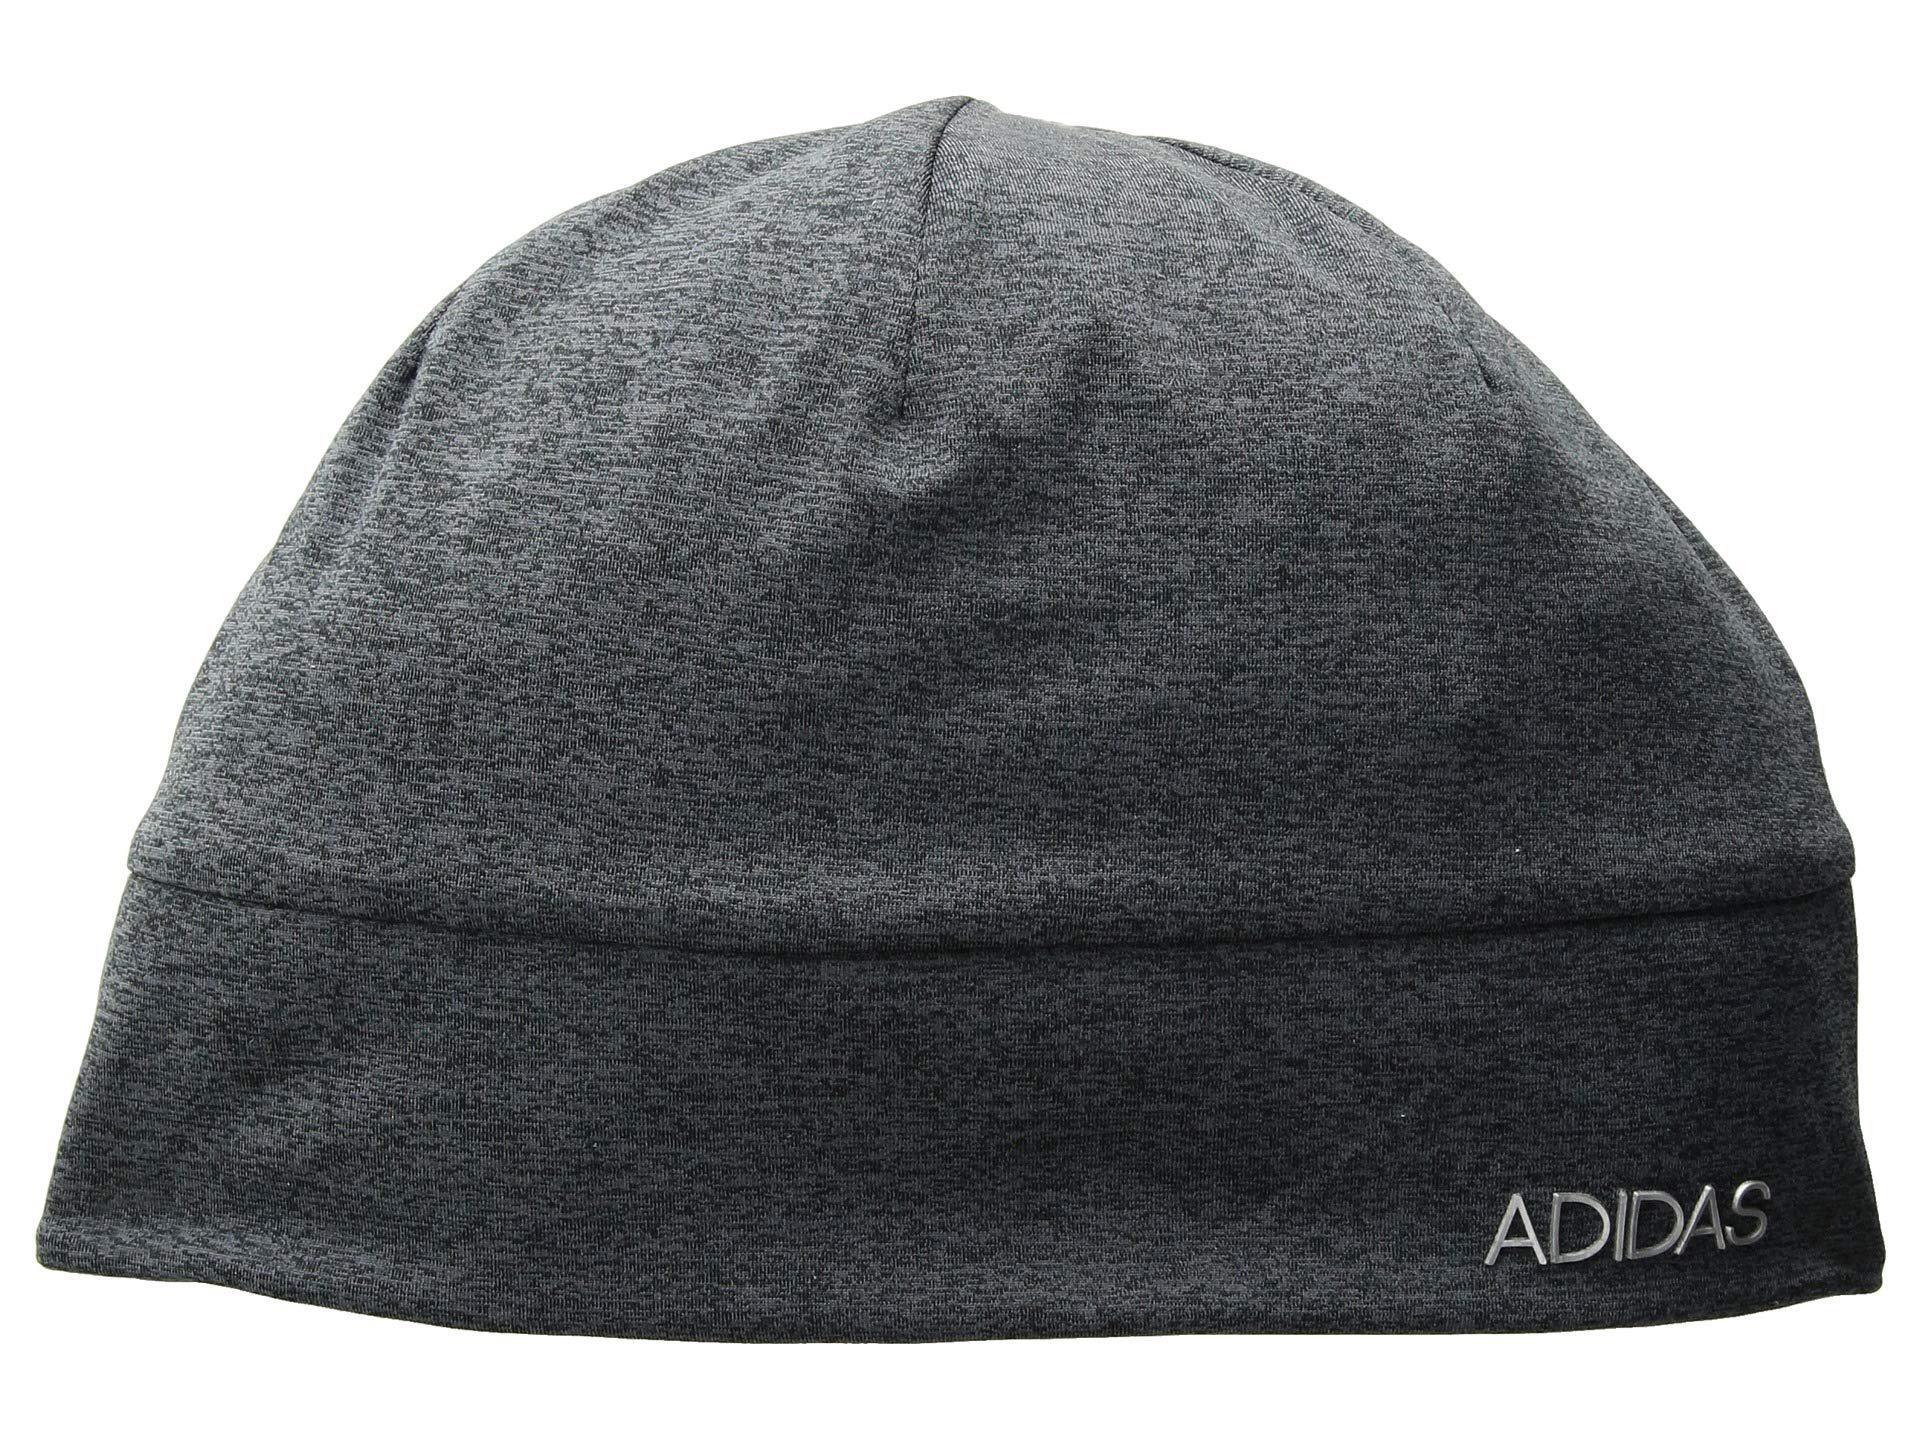 3e7a0f6bb70 Adidas - Heather Tech Beanie (black deepest Space matte Silver 1) Beanies.  View fullscreen